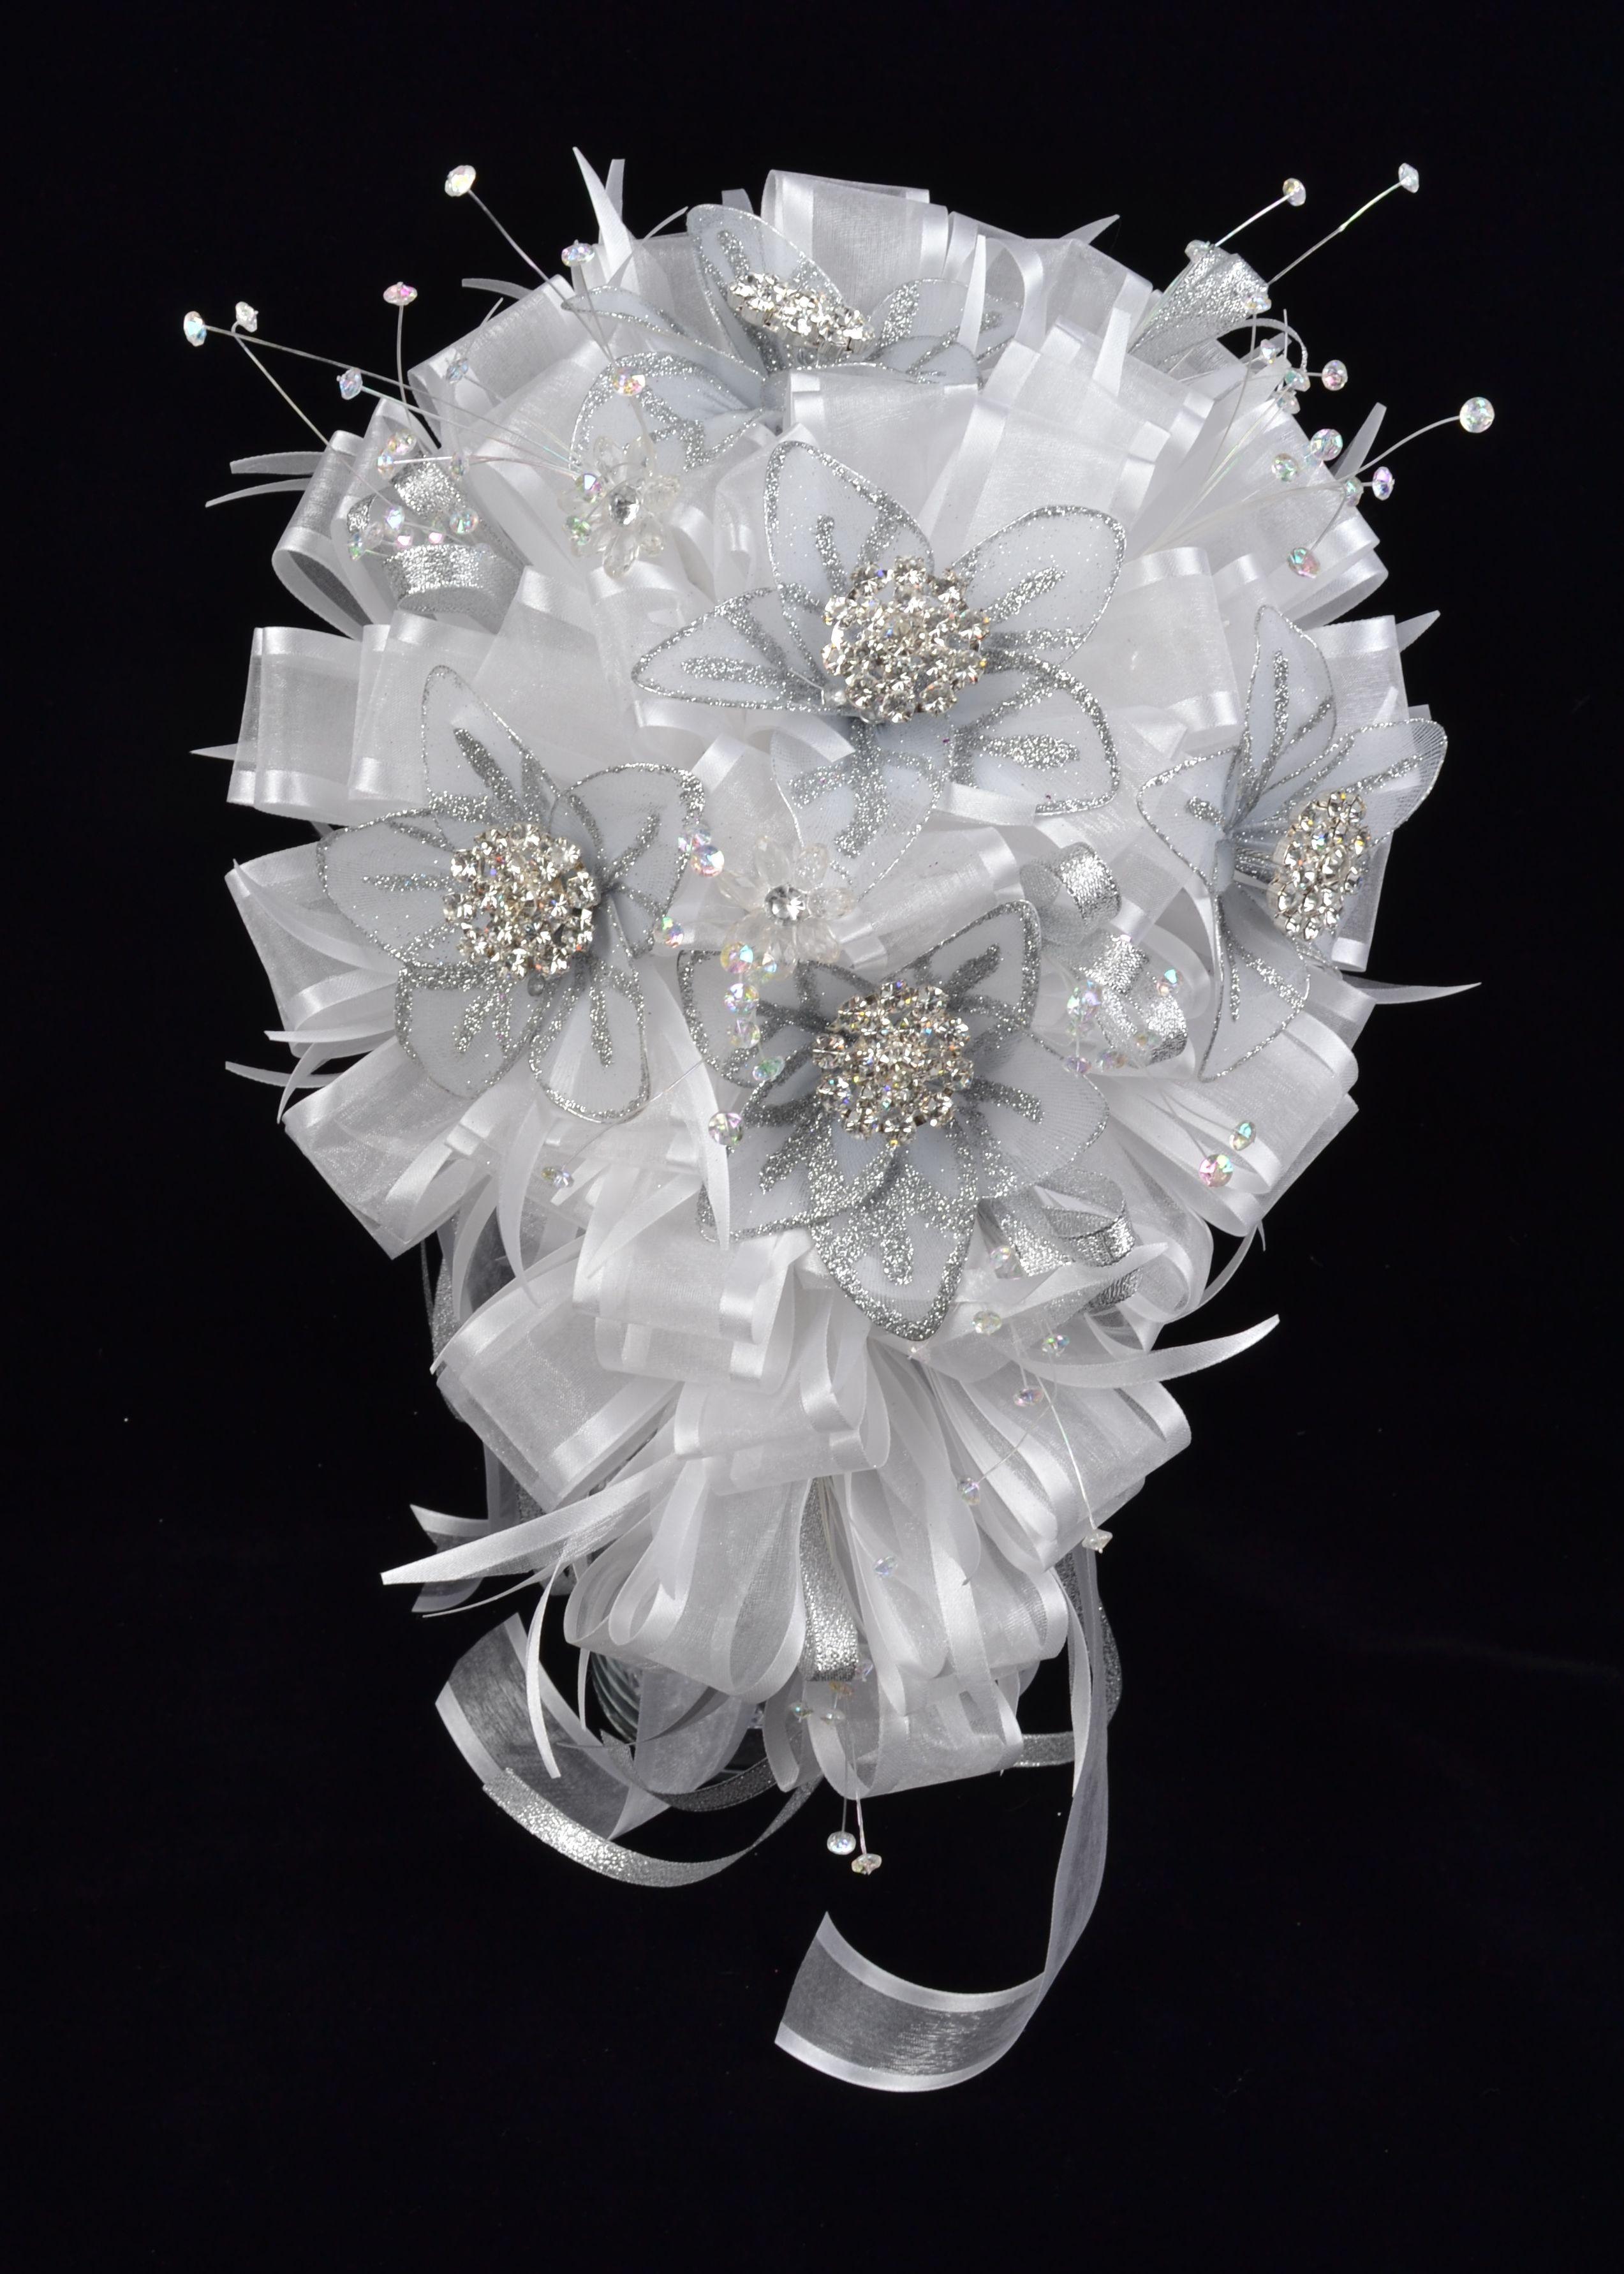 Lovely white quinceanera flower bouquet ideal for your quincedress lovely white quinceanera flower bouquet ideal for your quincedress misquince izmirmasajfo